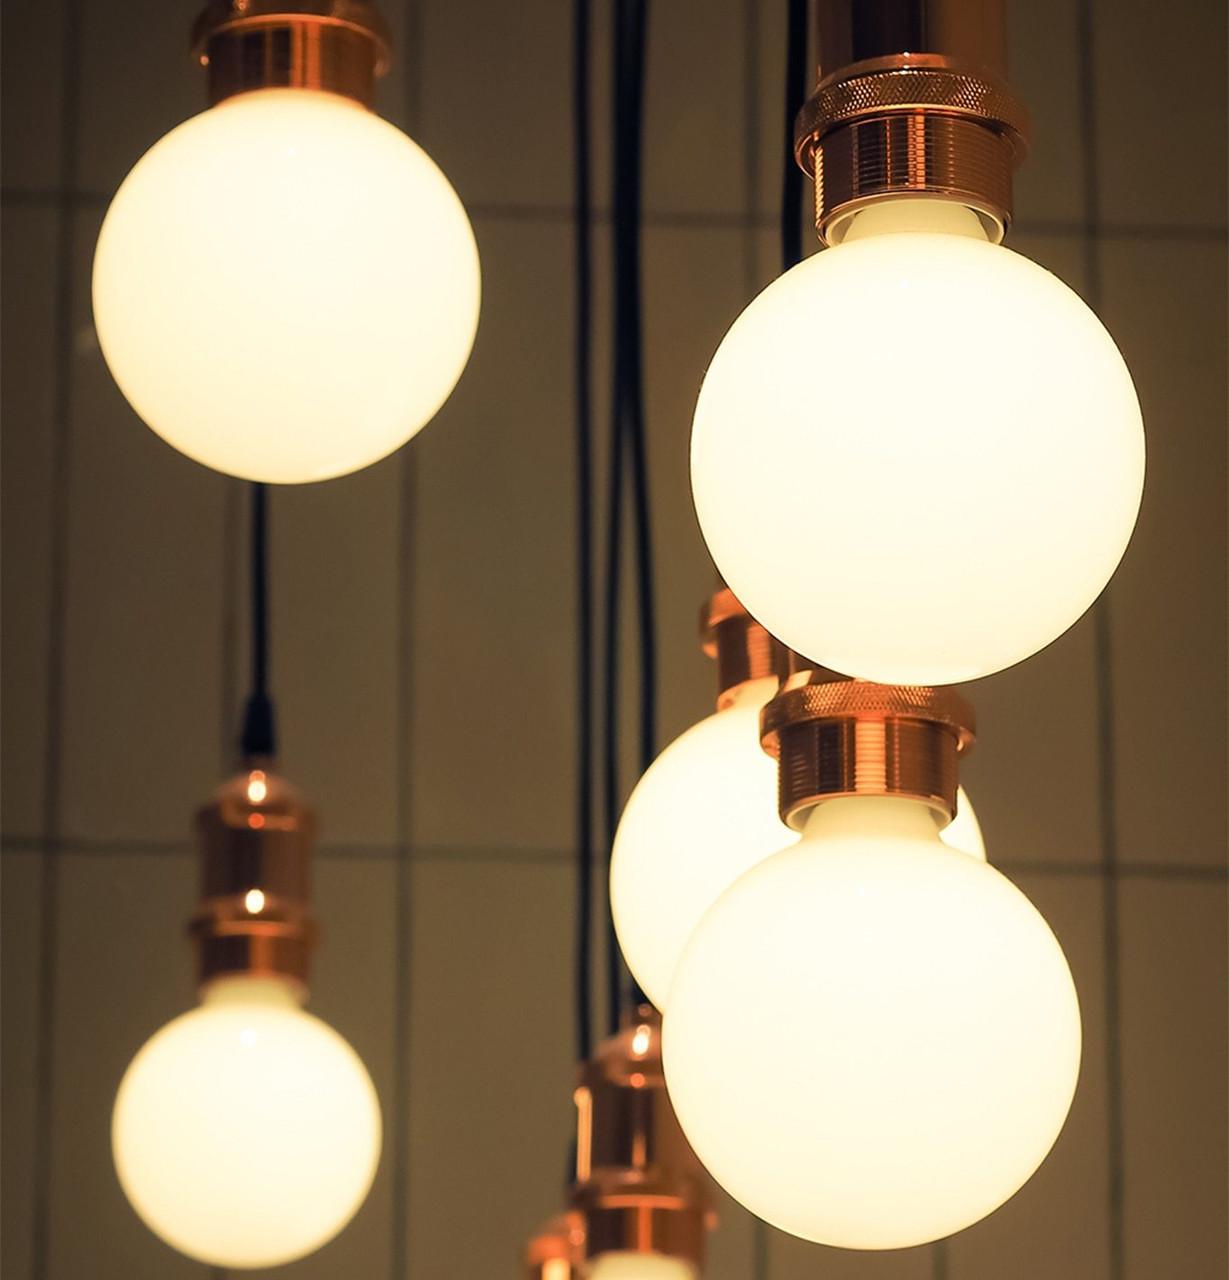 LED Globe ES Light Bulbs